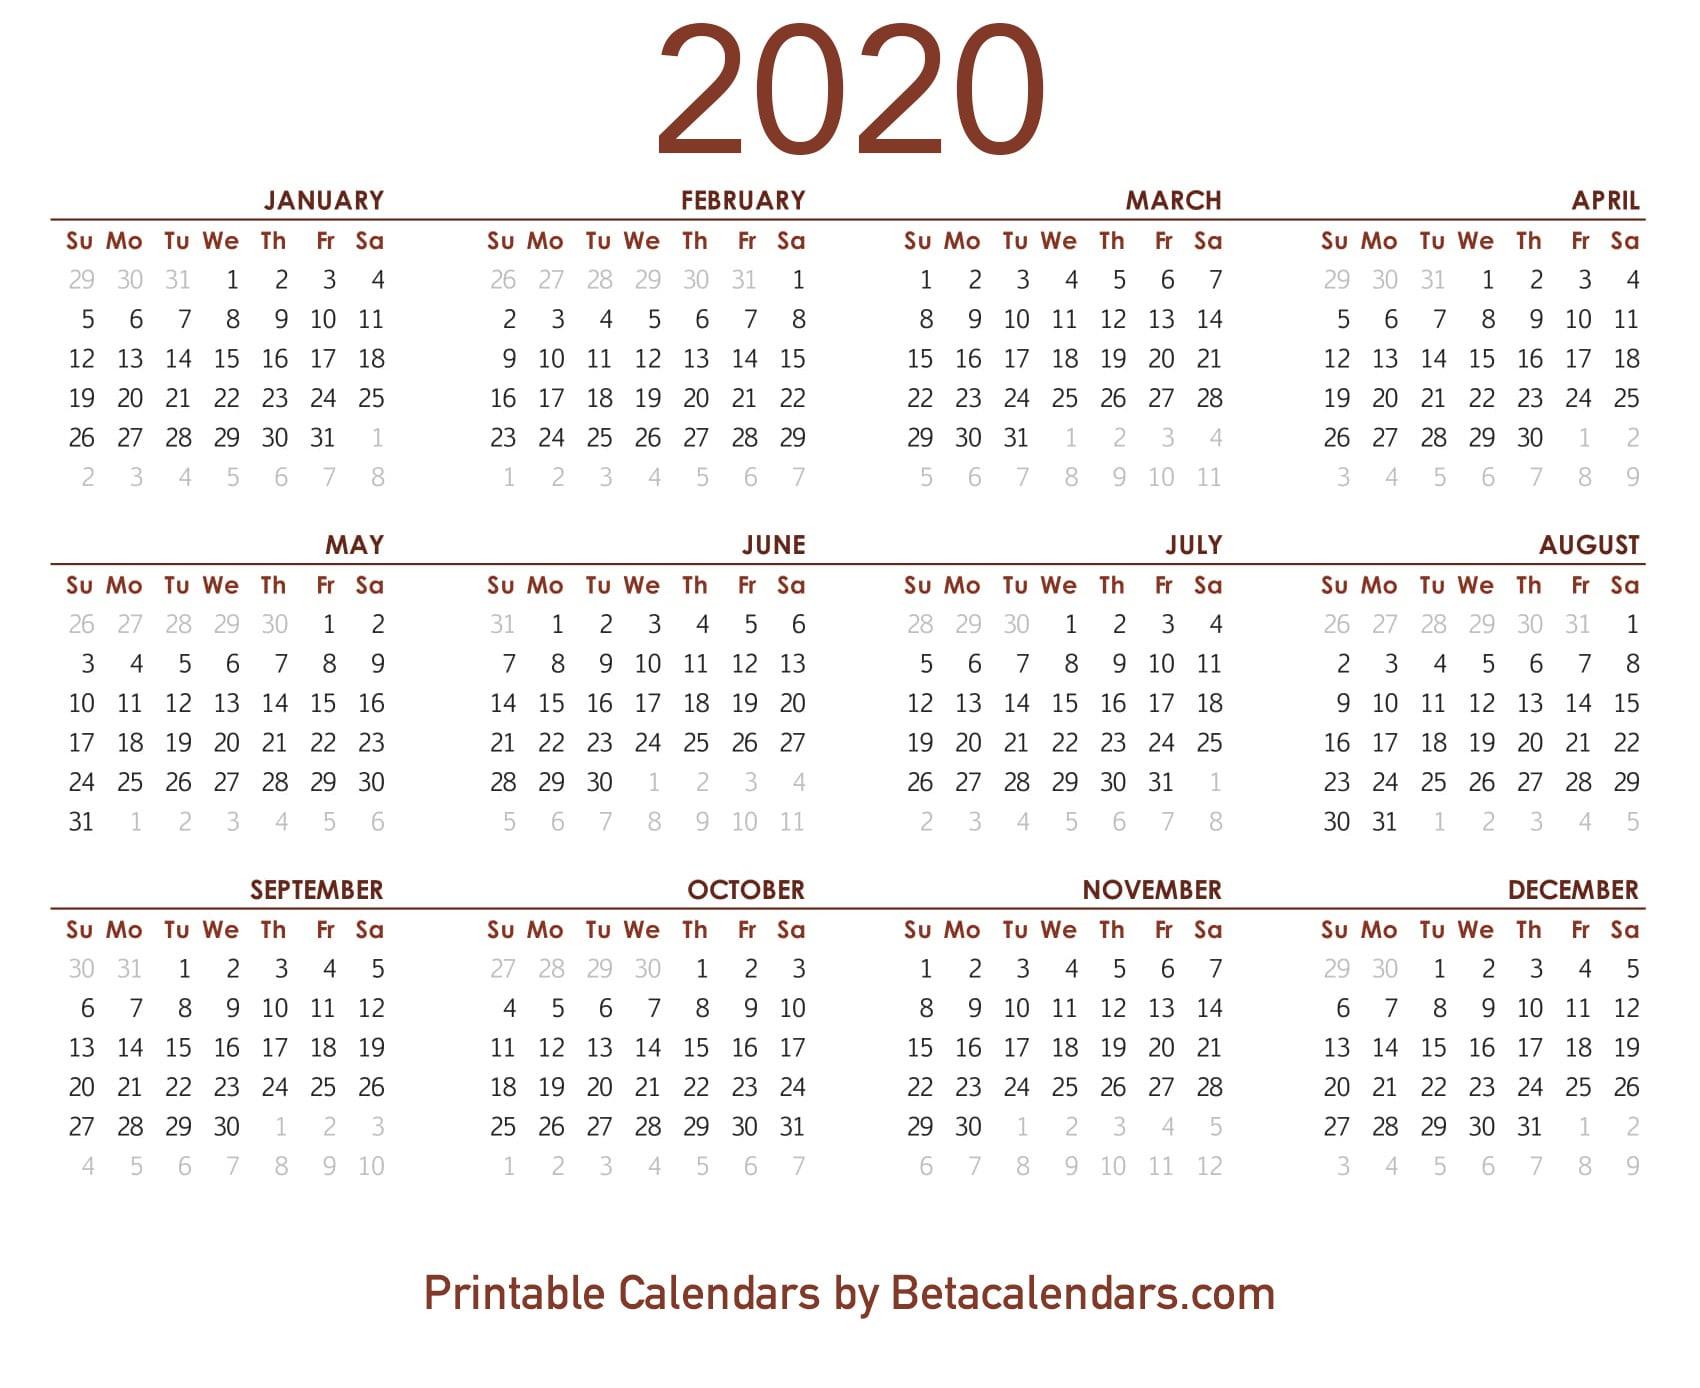 2020 Calendar - Beta Calendars